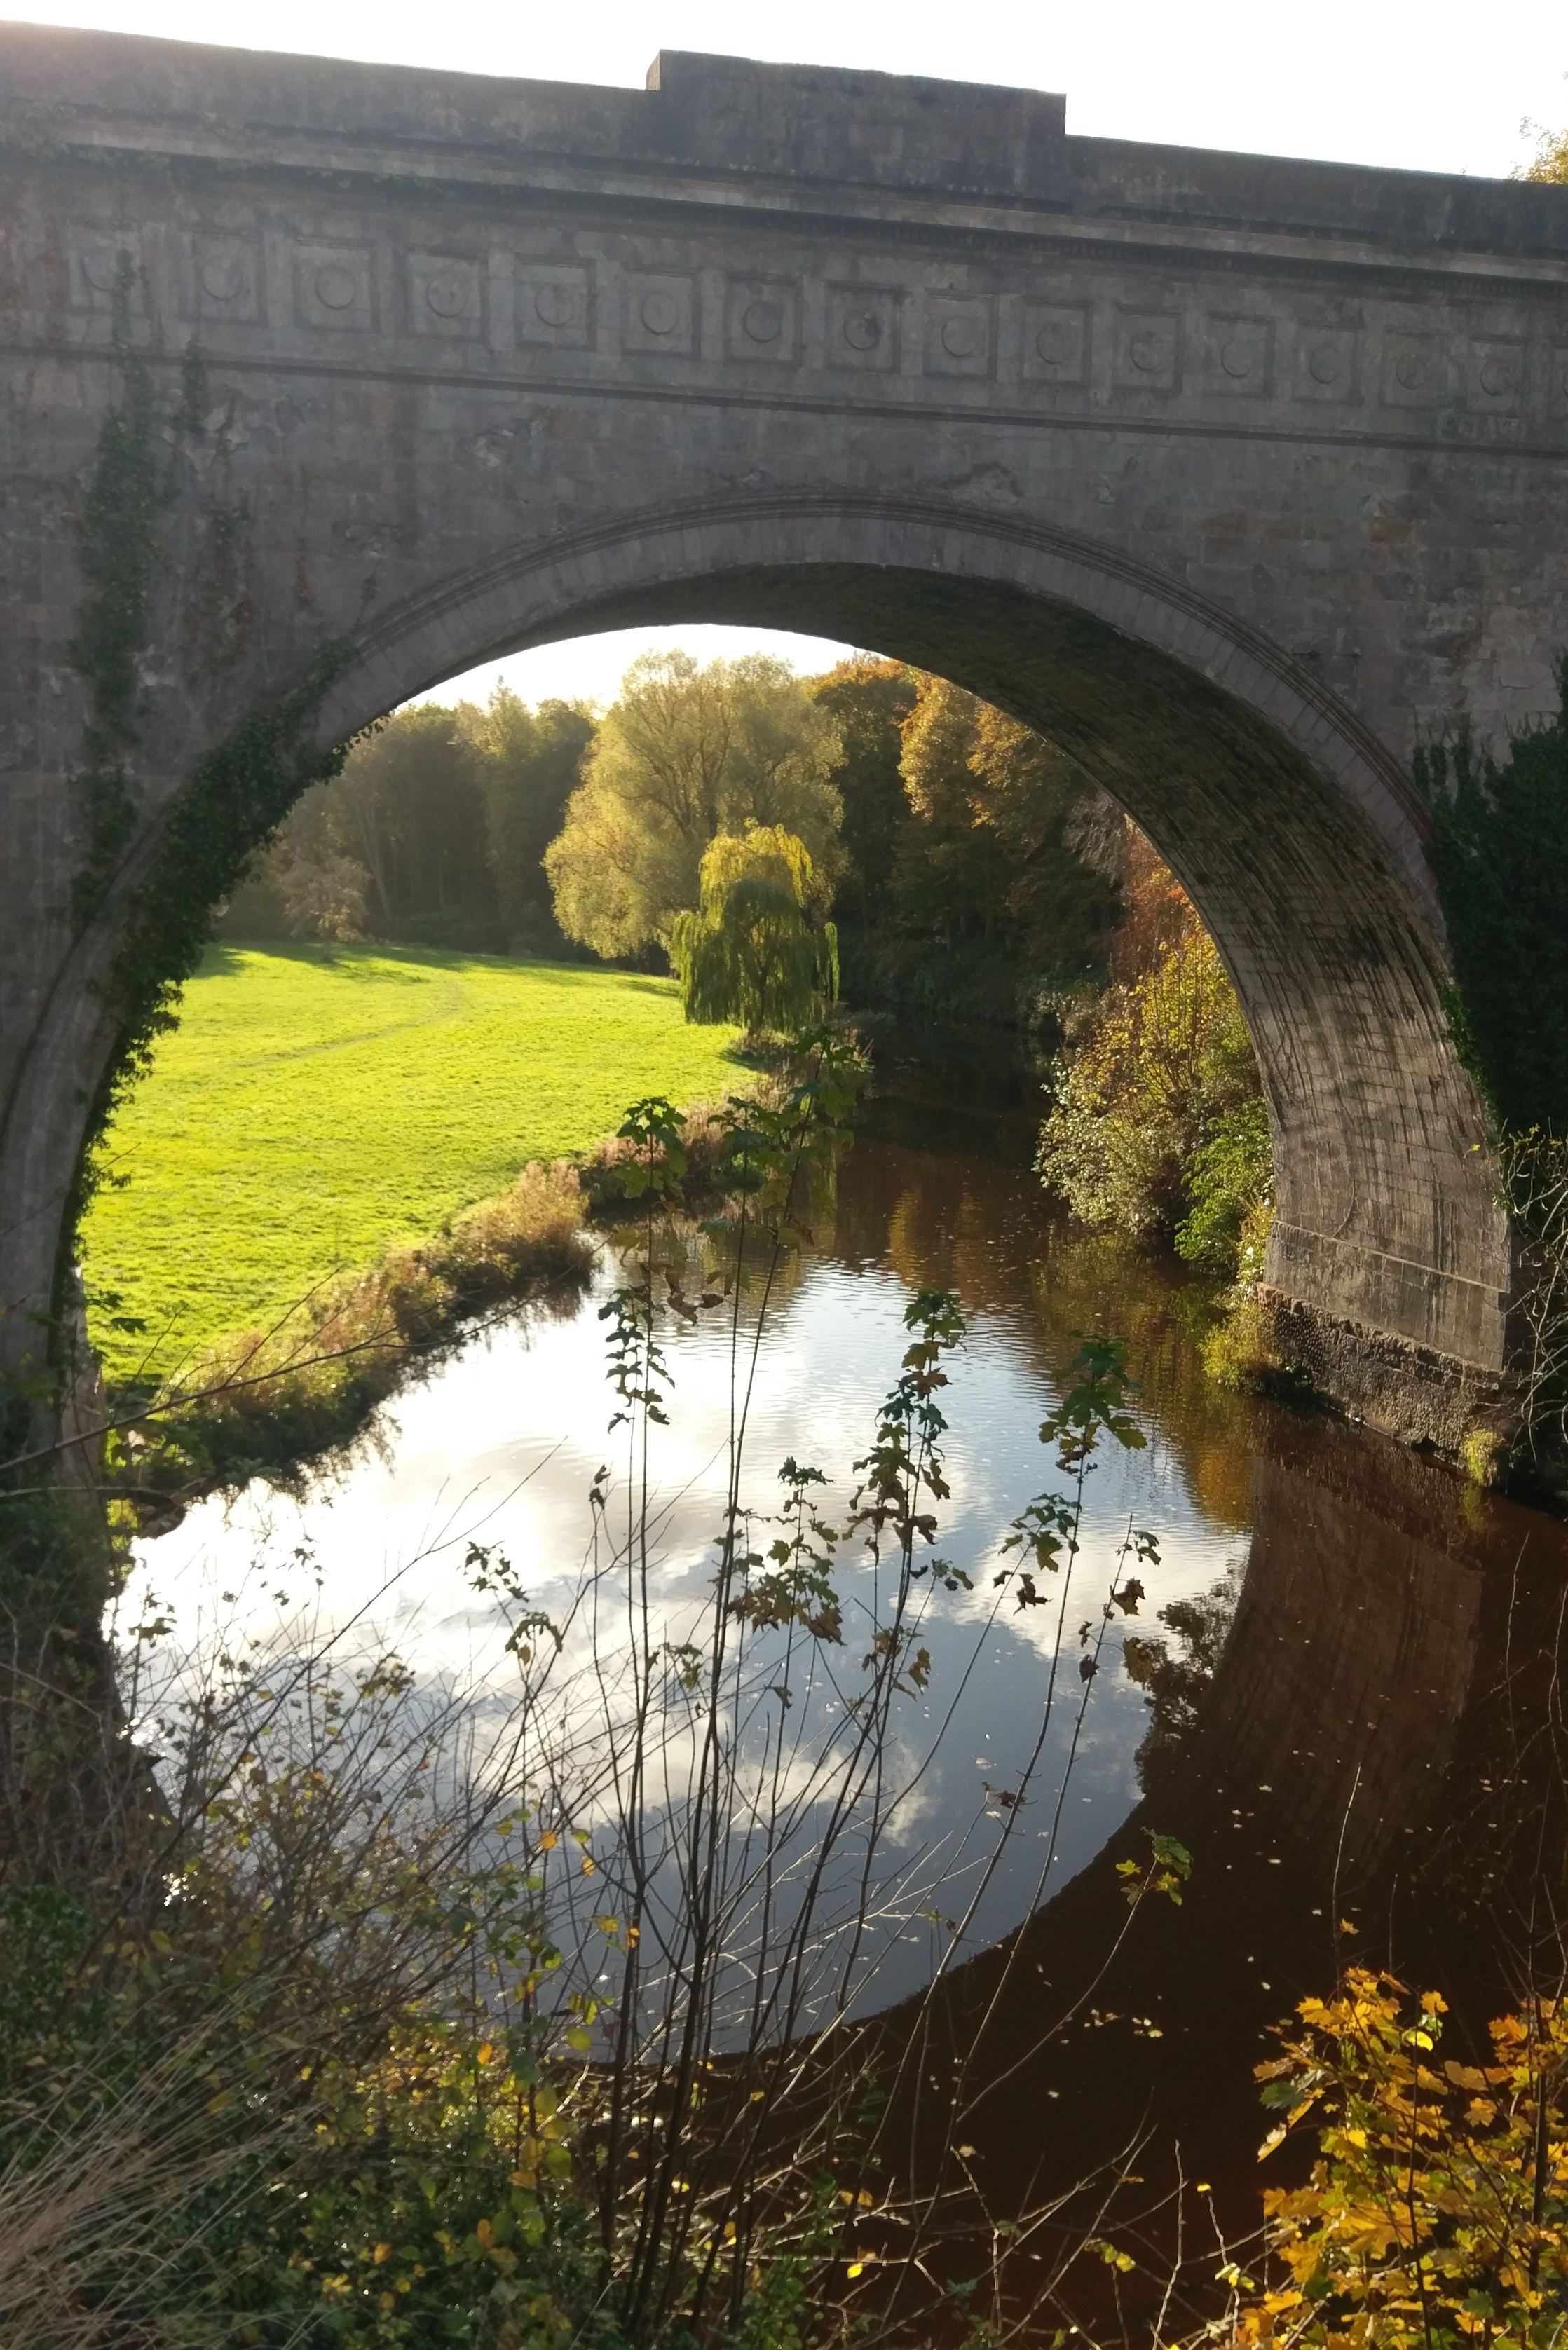 Bridge over the River Esk, Dalkeith, Midlothian